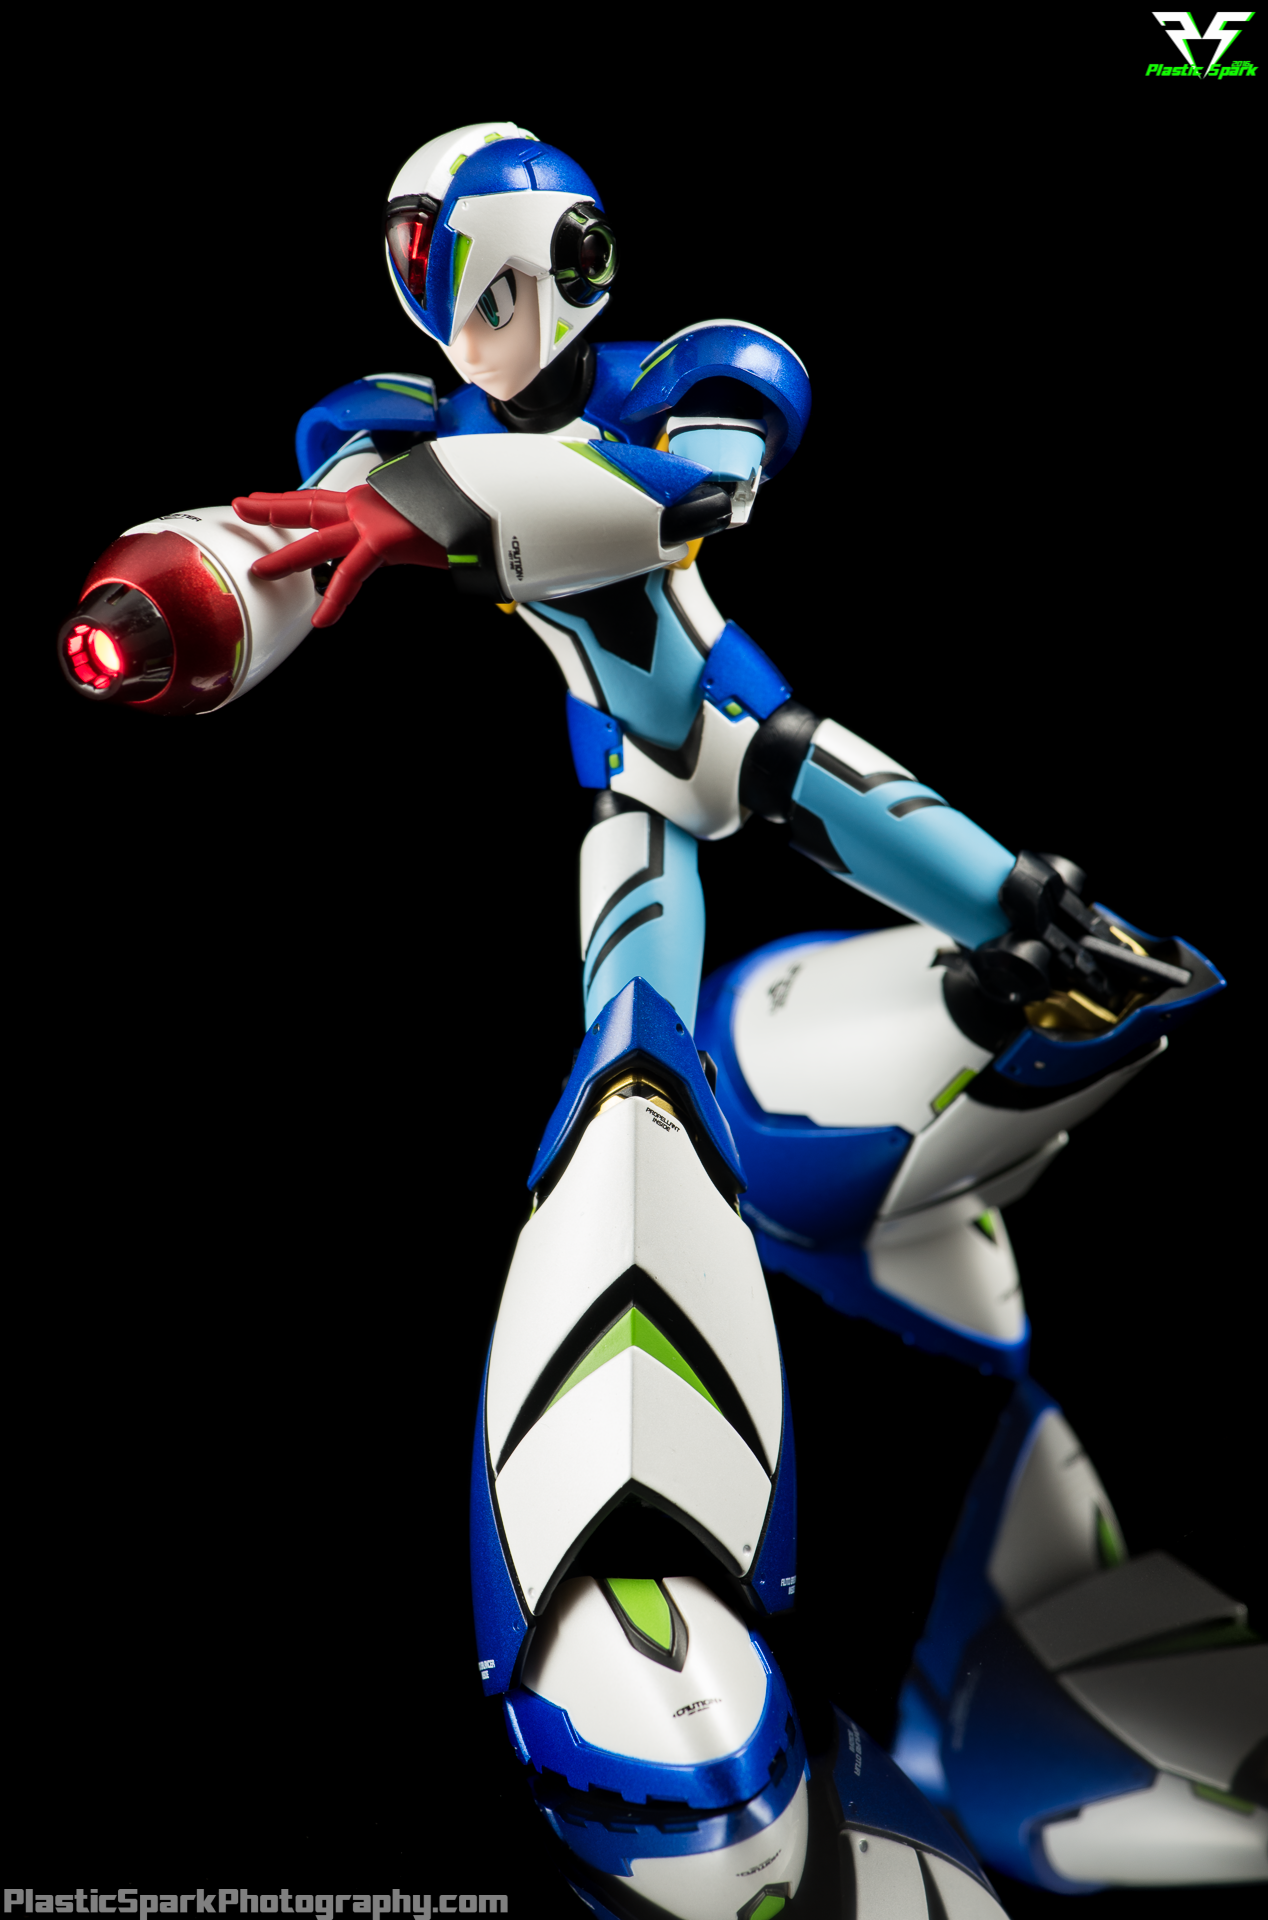 Truforce-Megaman-X-Boost-(10-of-17).png